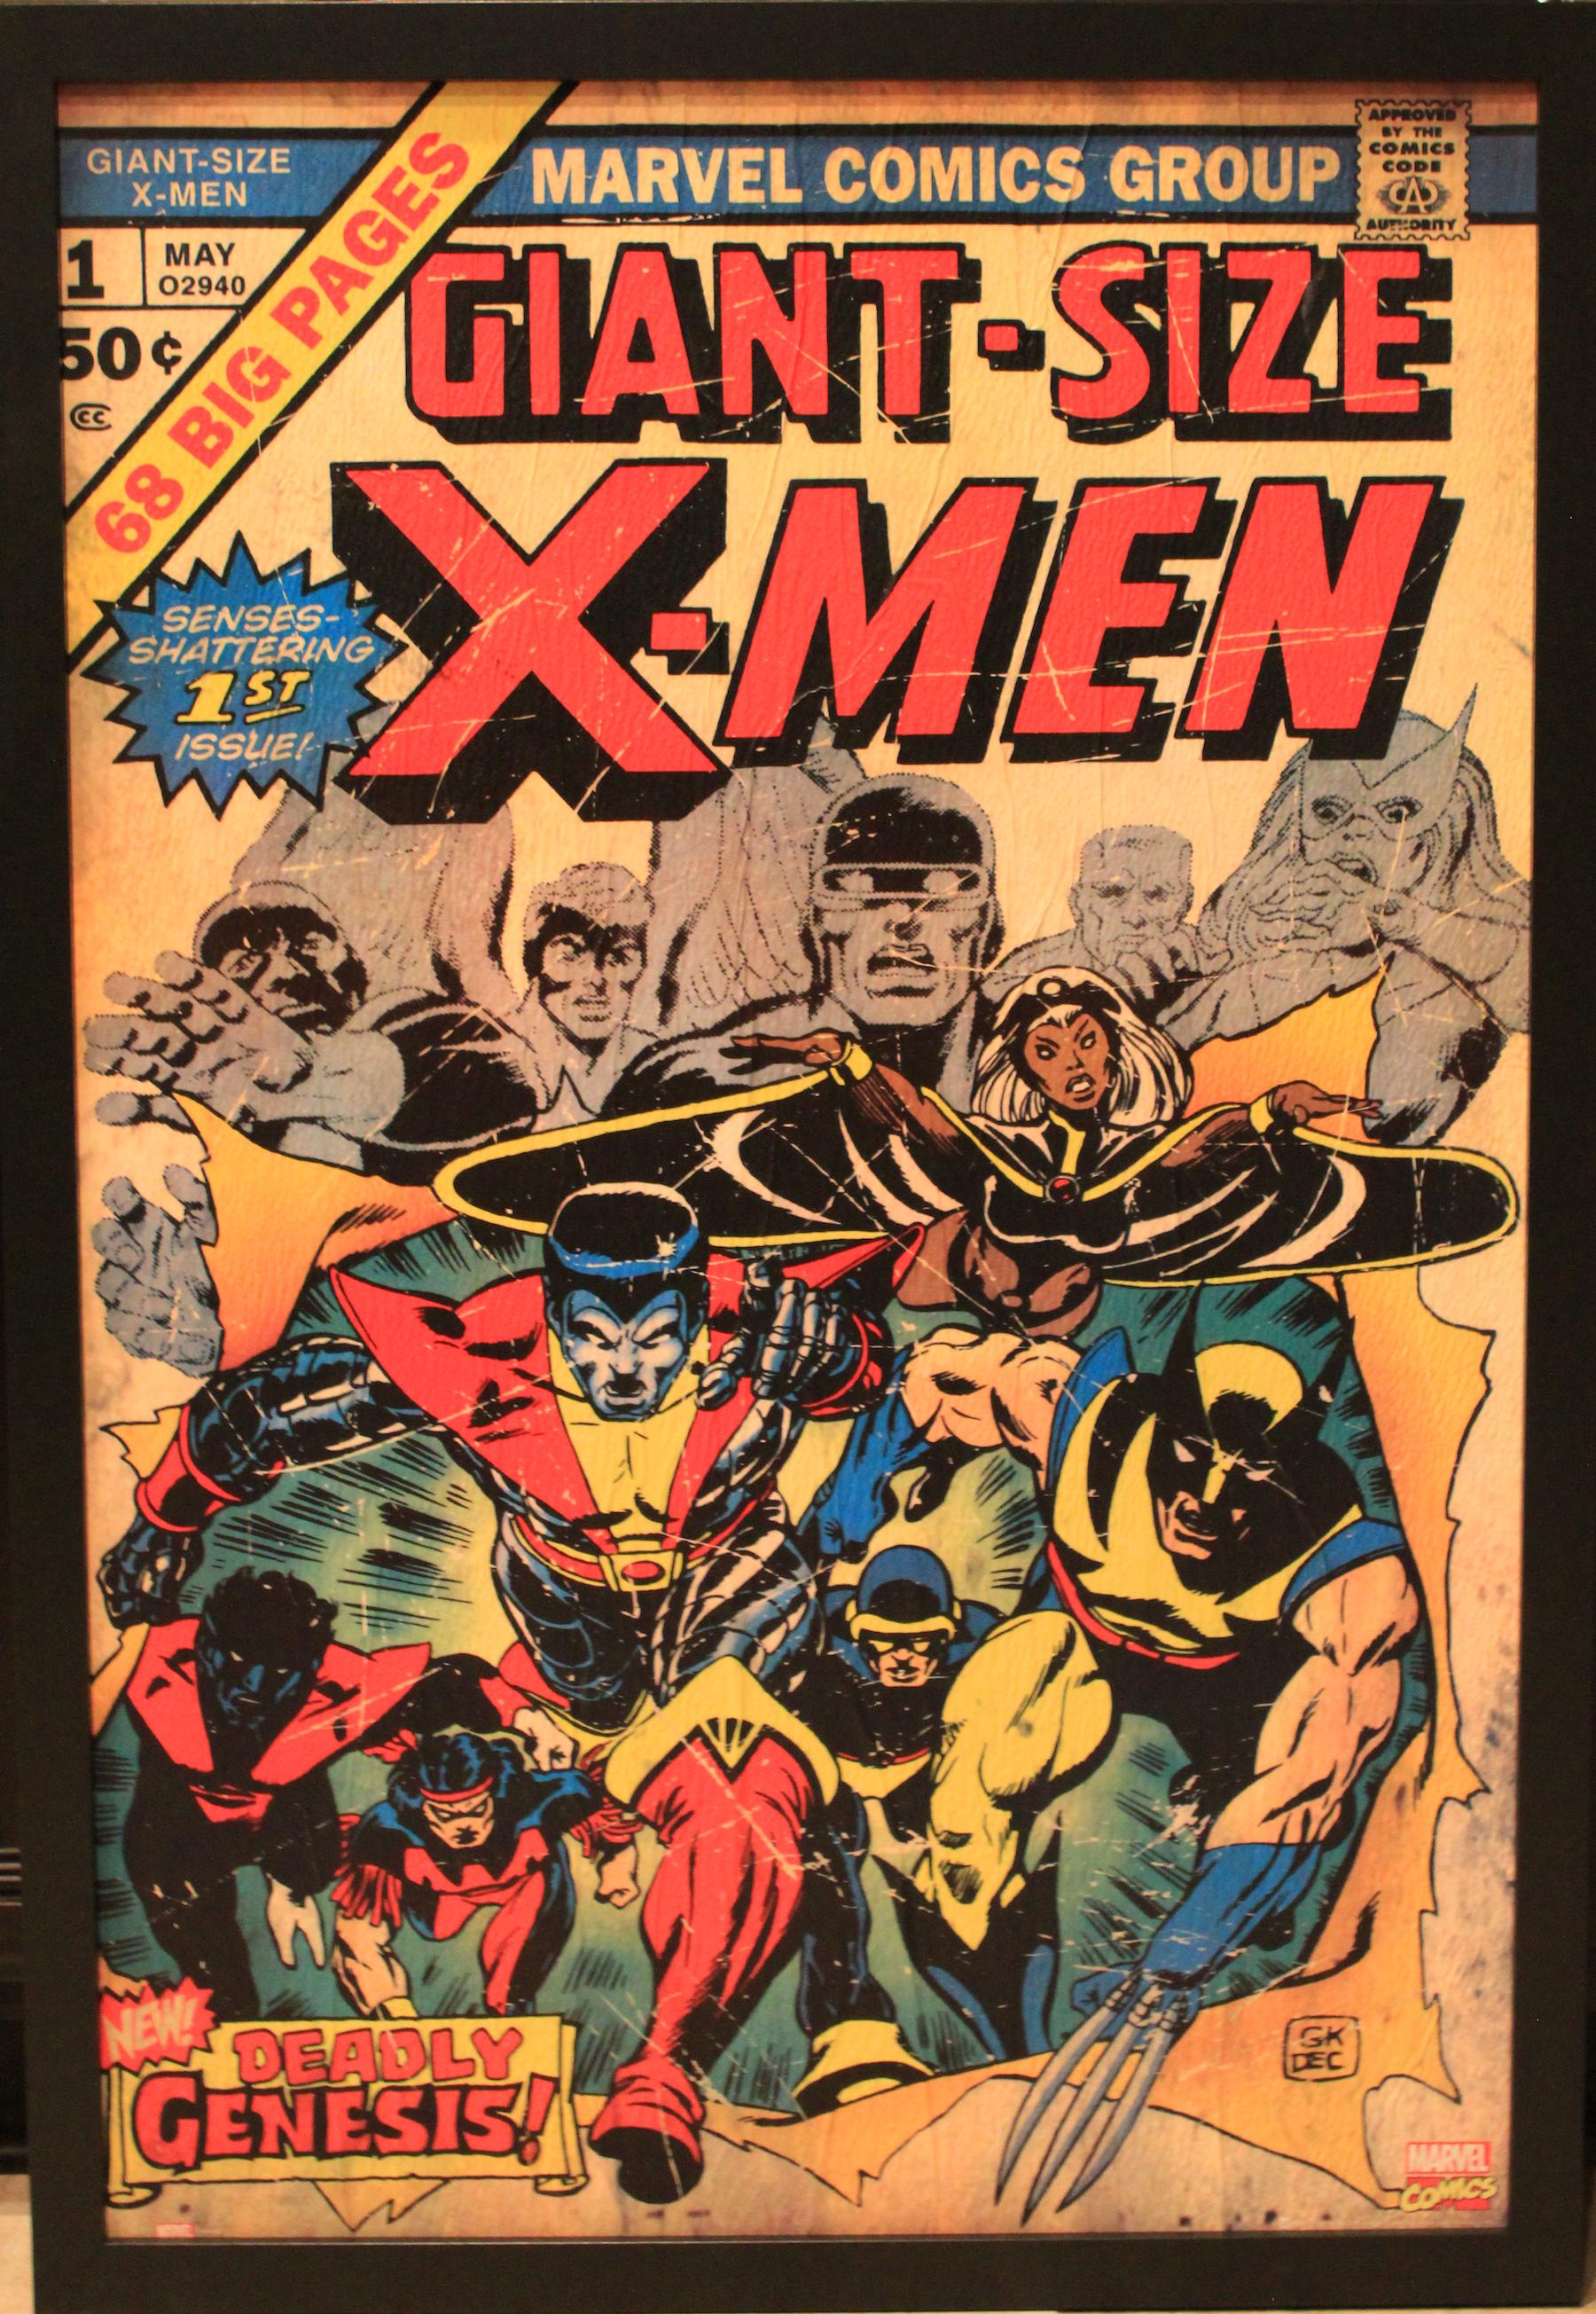 Comic Poster Textured Bonded And Framed Marvel Comic Books Comic Book Covers Comic Covers